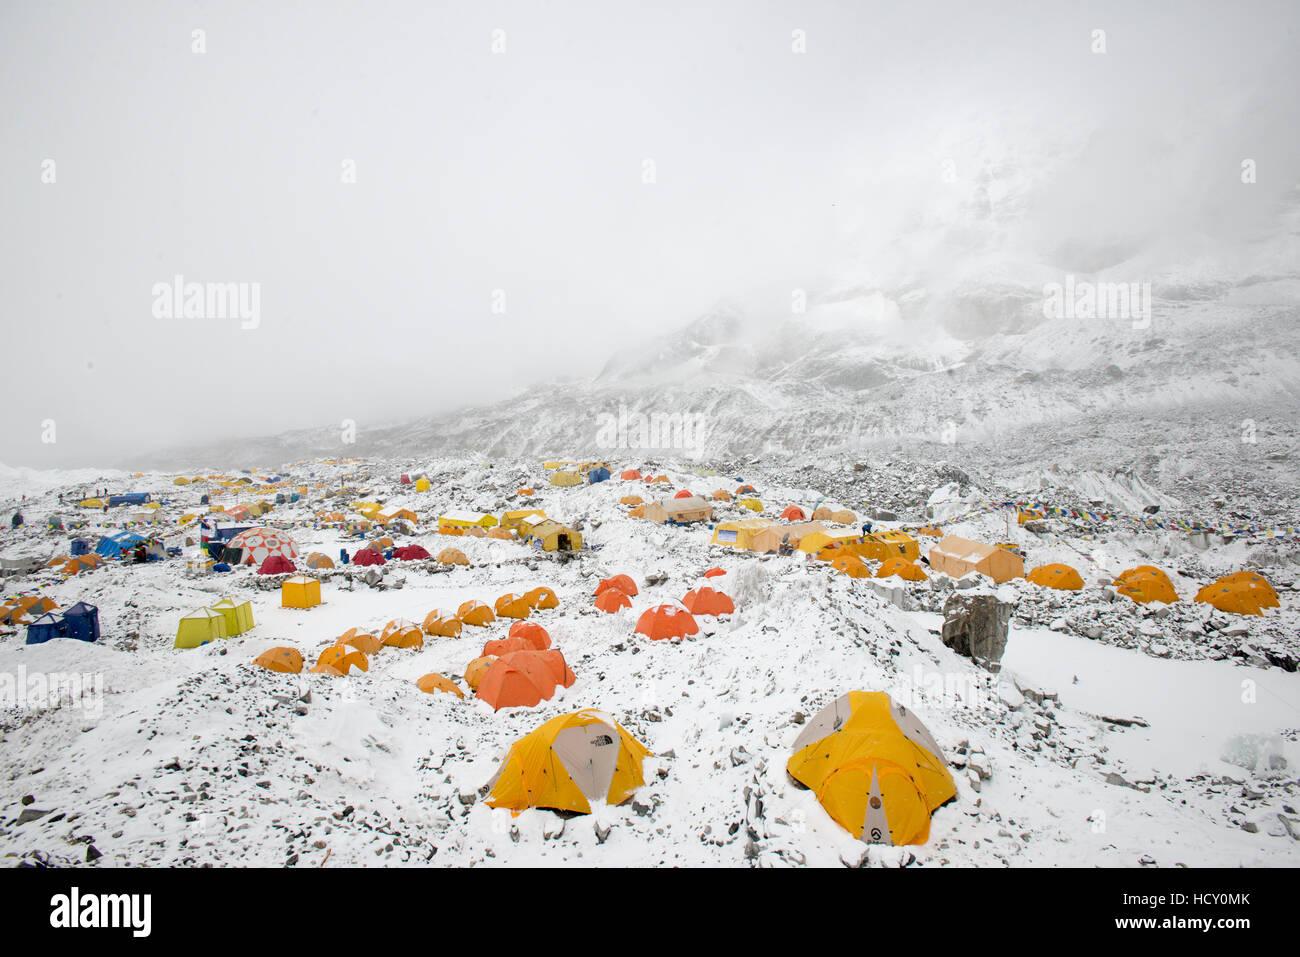 Everest Base Camp at the end of the Khumbu glacier lies at 5350m, Khumbu Region, Nepal - Stock Image